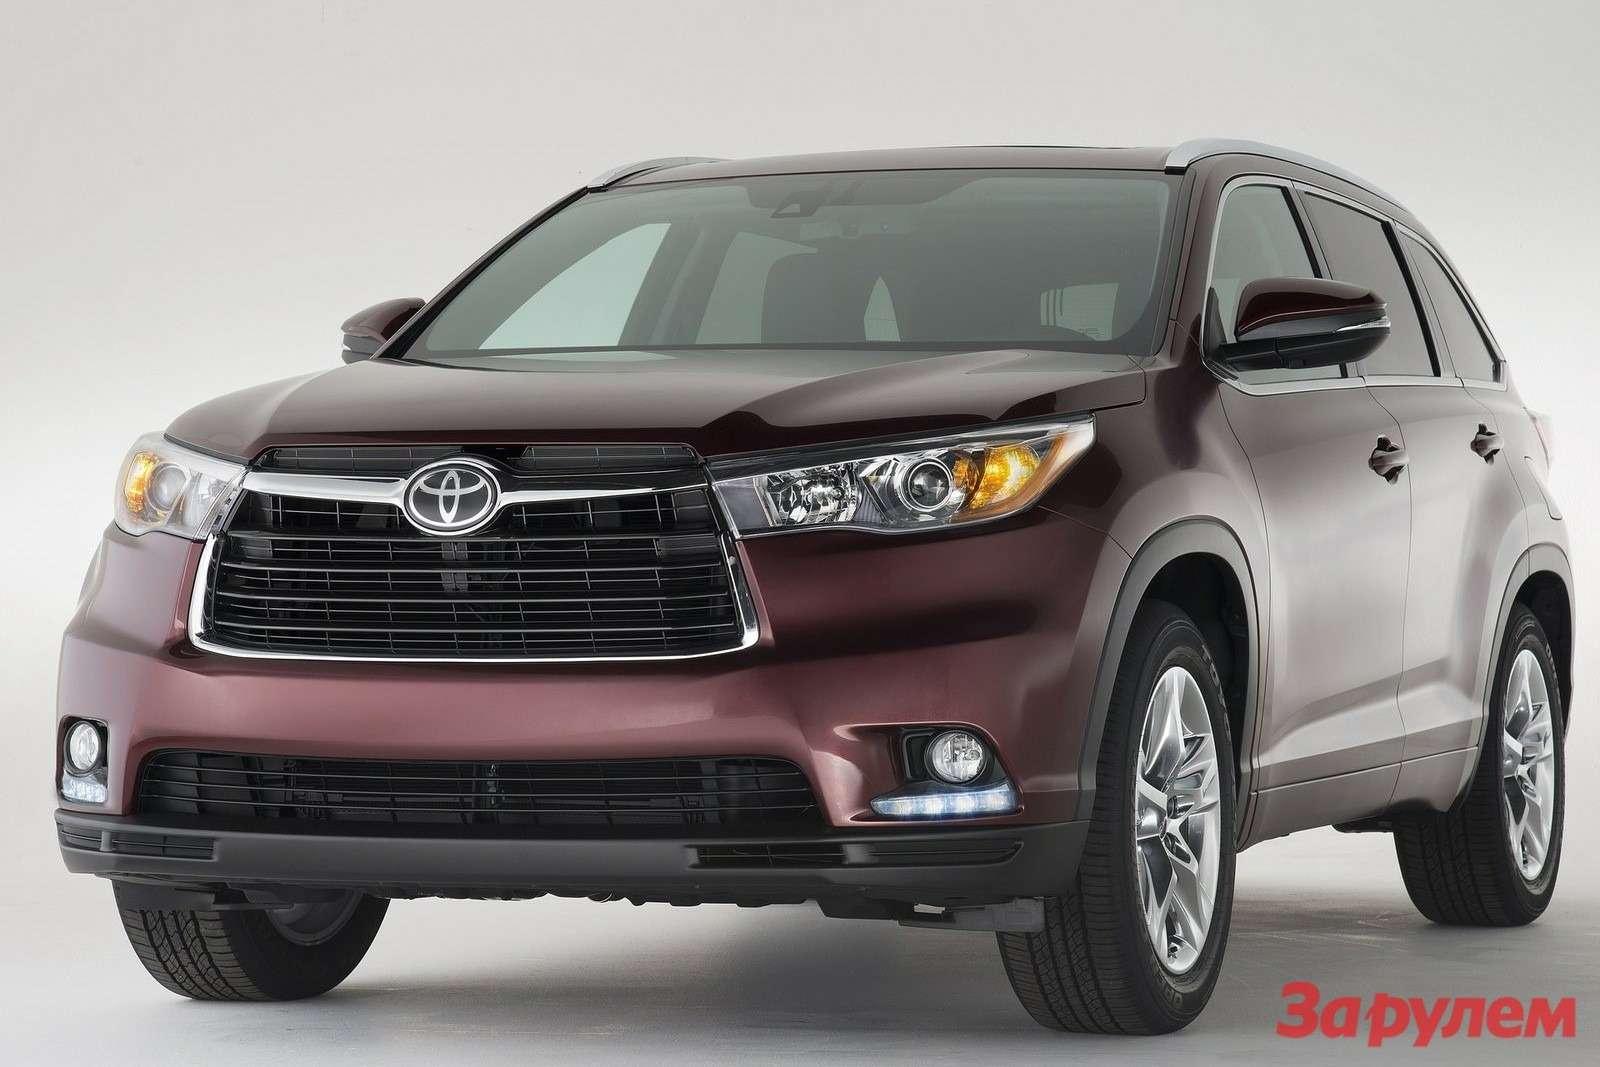 Toyota Highlander 2014 1600x1200 wallpaper 02